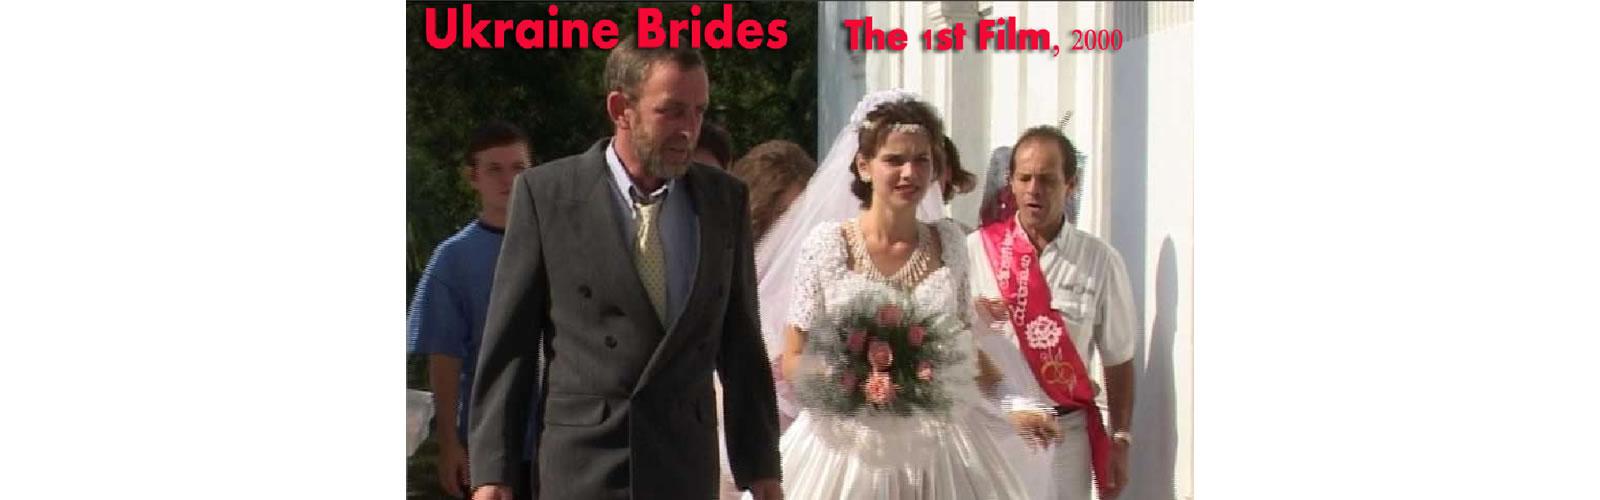 Ukraine Brides (2000-2001)